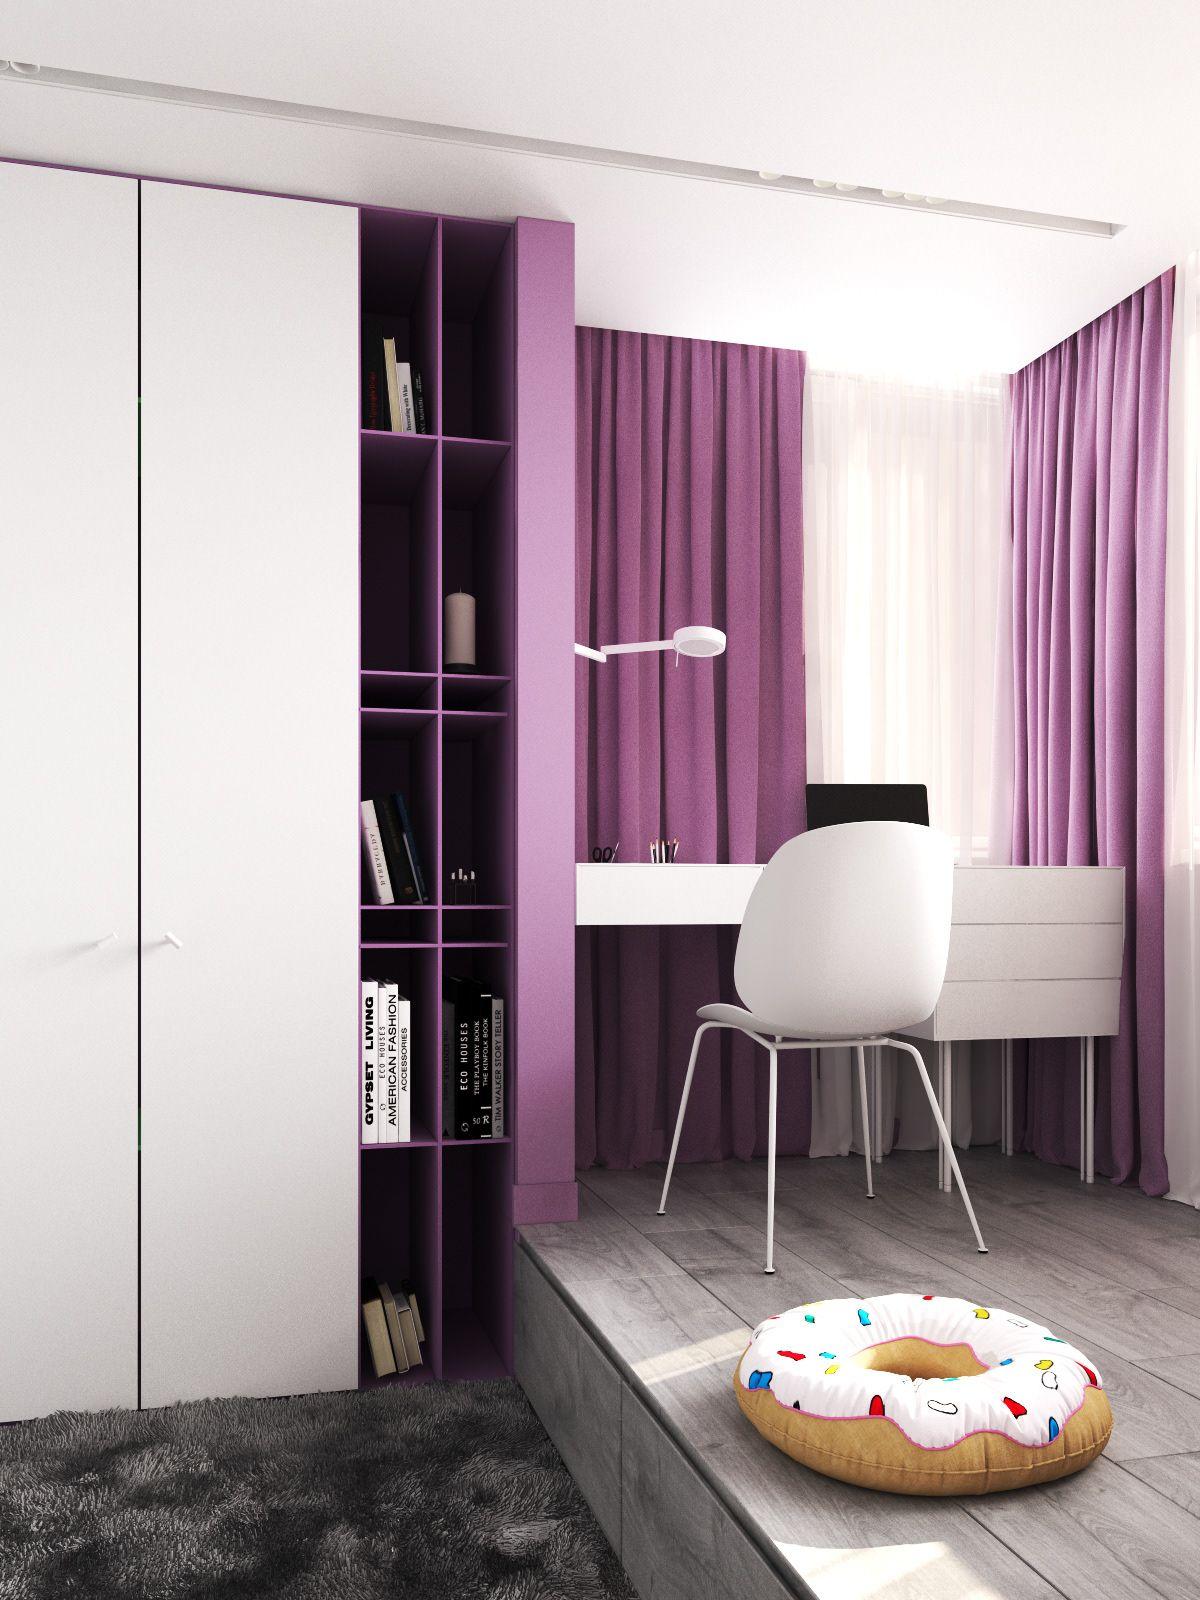 Home Design Hd M2 On Behance Design Designinteriors Homedesign